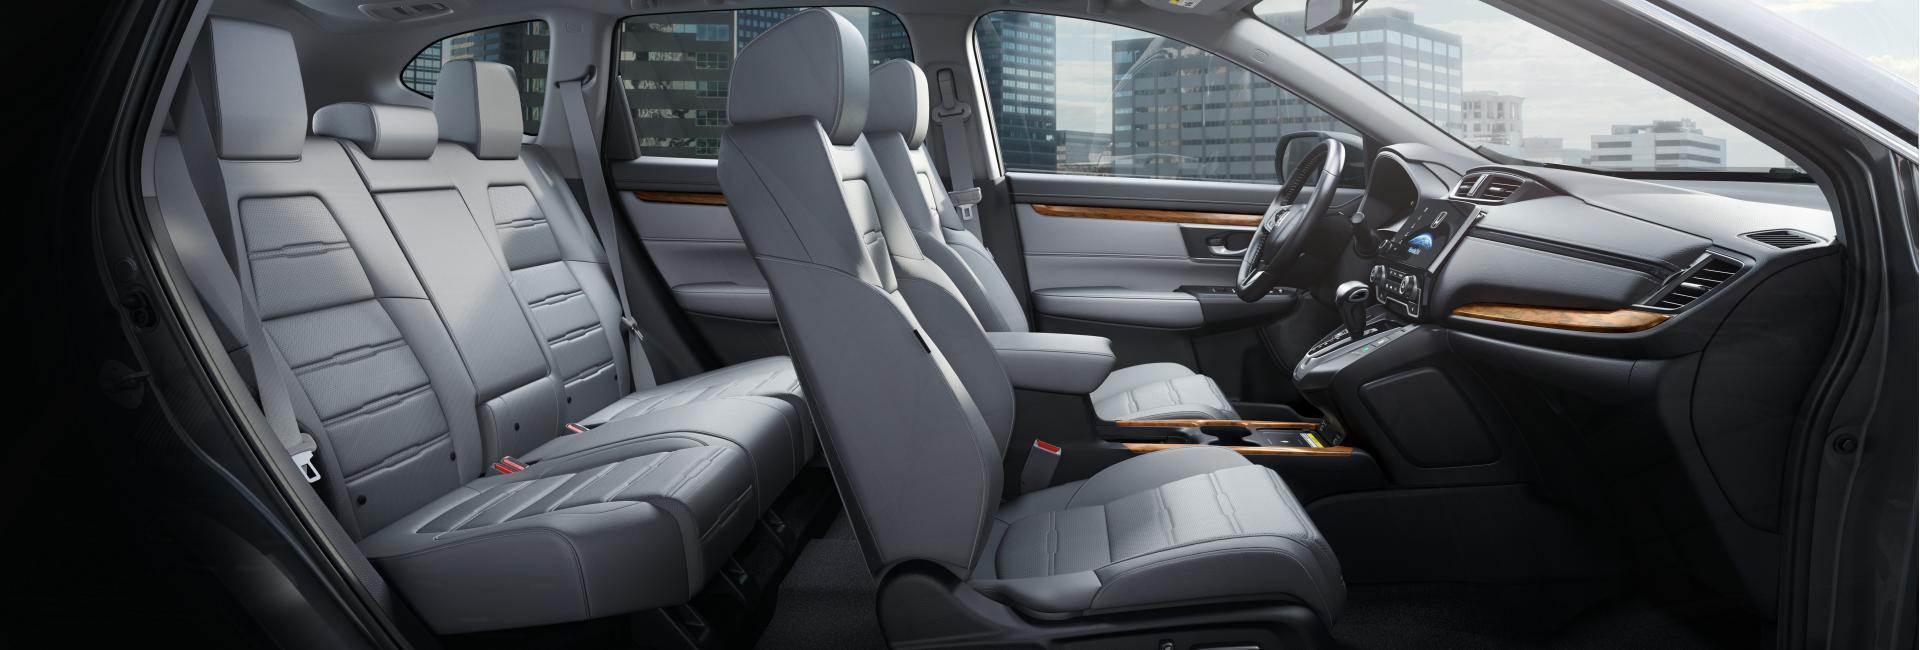 Cross-Section view of a 2021 Honda CR-V's interior